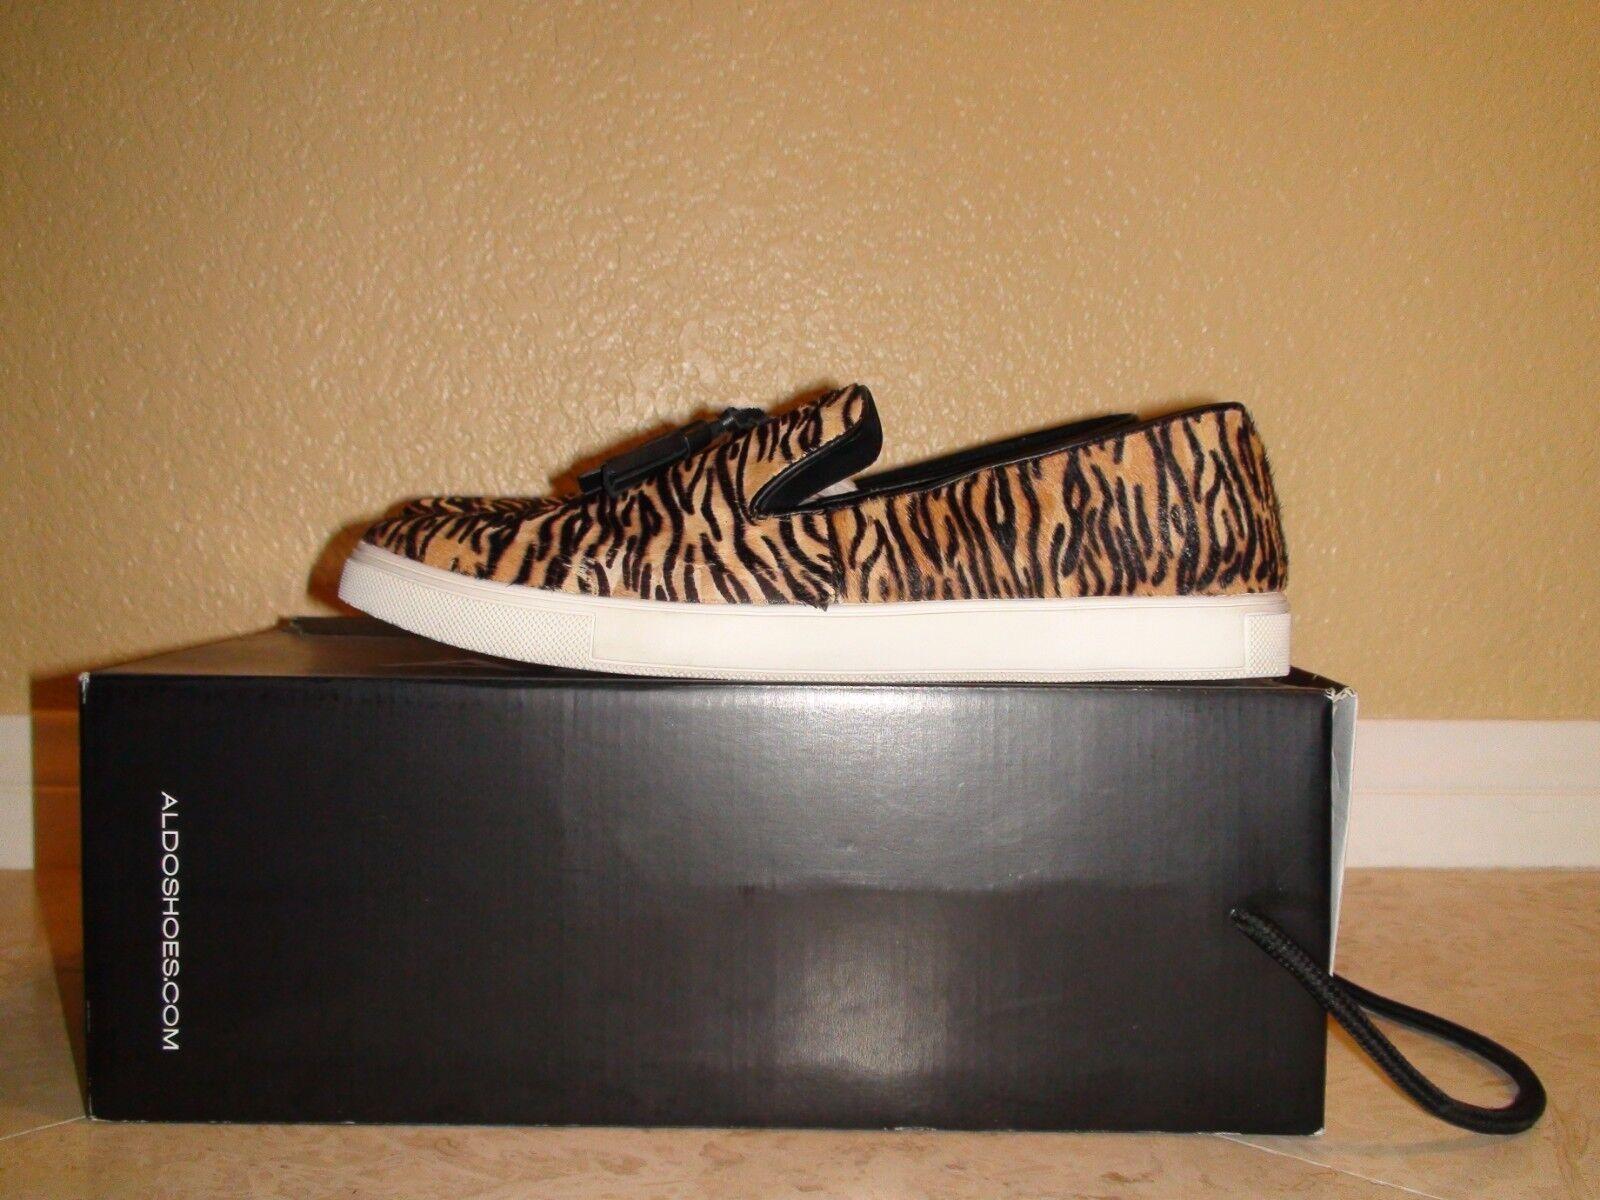 Men's Aldo Wibba Casual Faux Animal Loafers Sz 42 Eur 9 US Slip On Canvas shoes